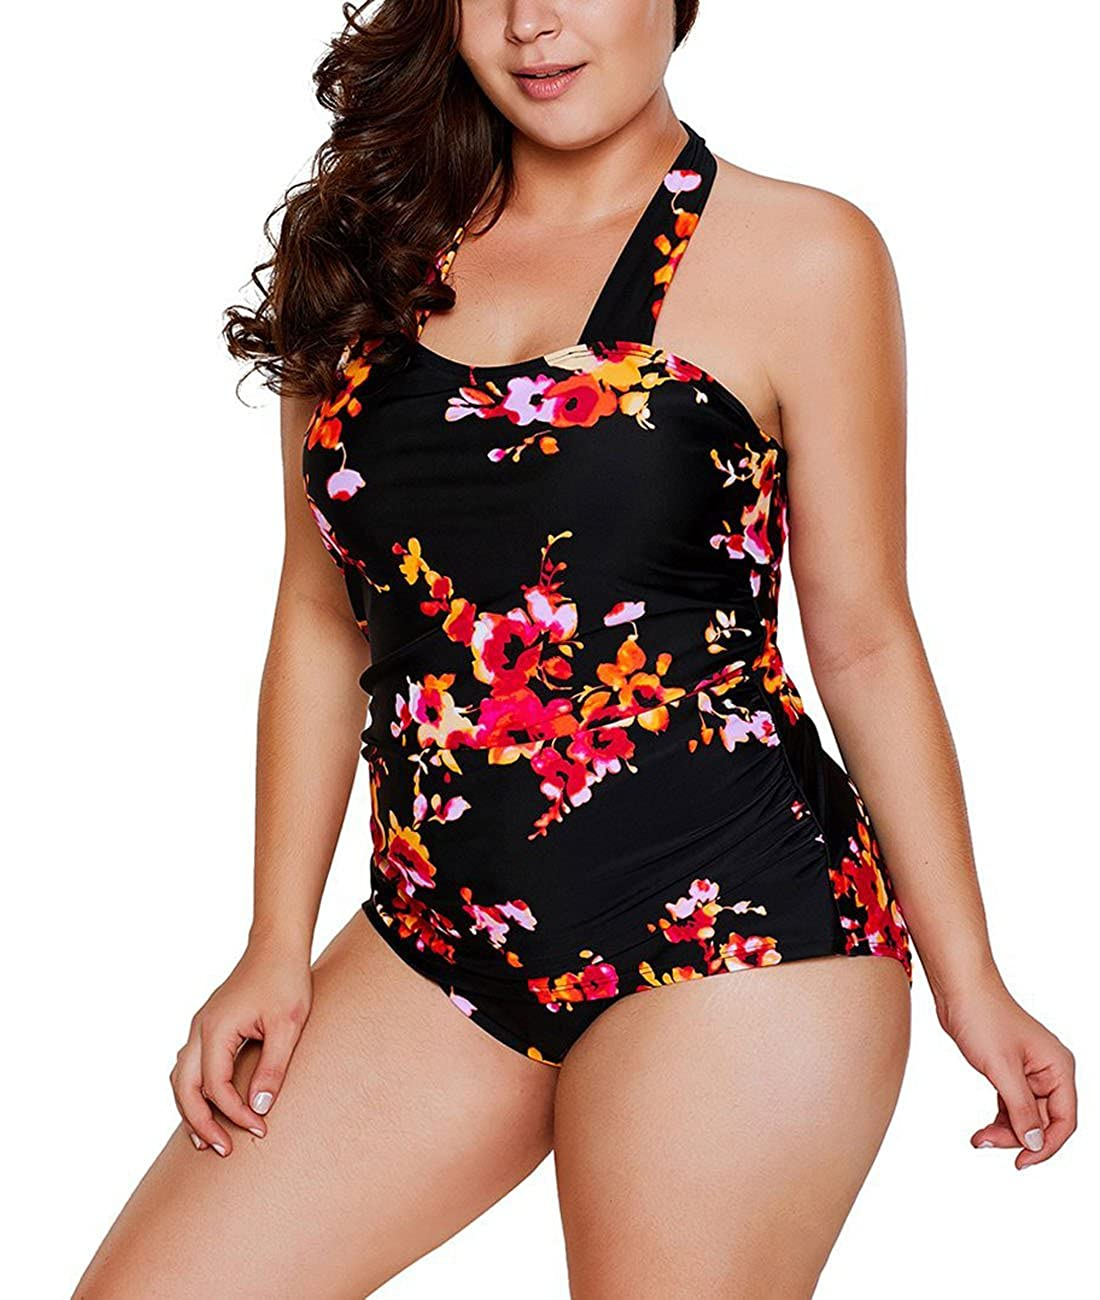 WoldGirls Women Lace Insert Ruched Slim Plus Size Monokini Swimsuit Bathing Suit